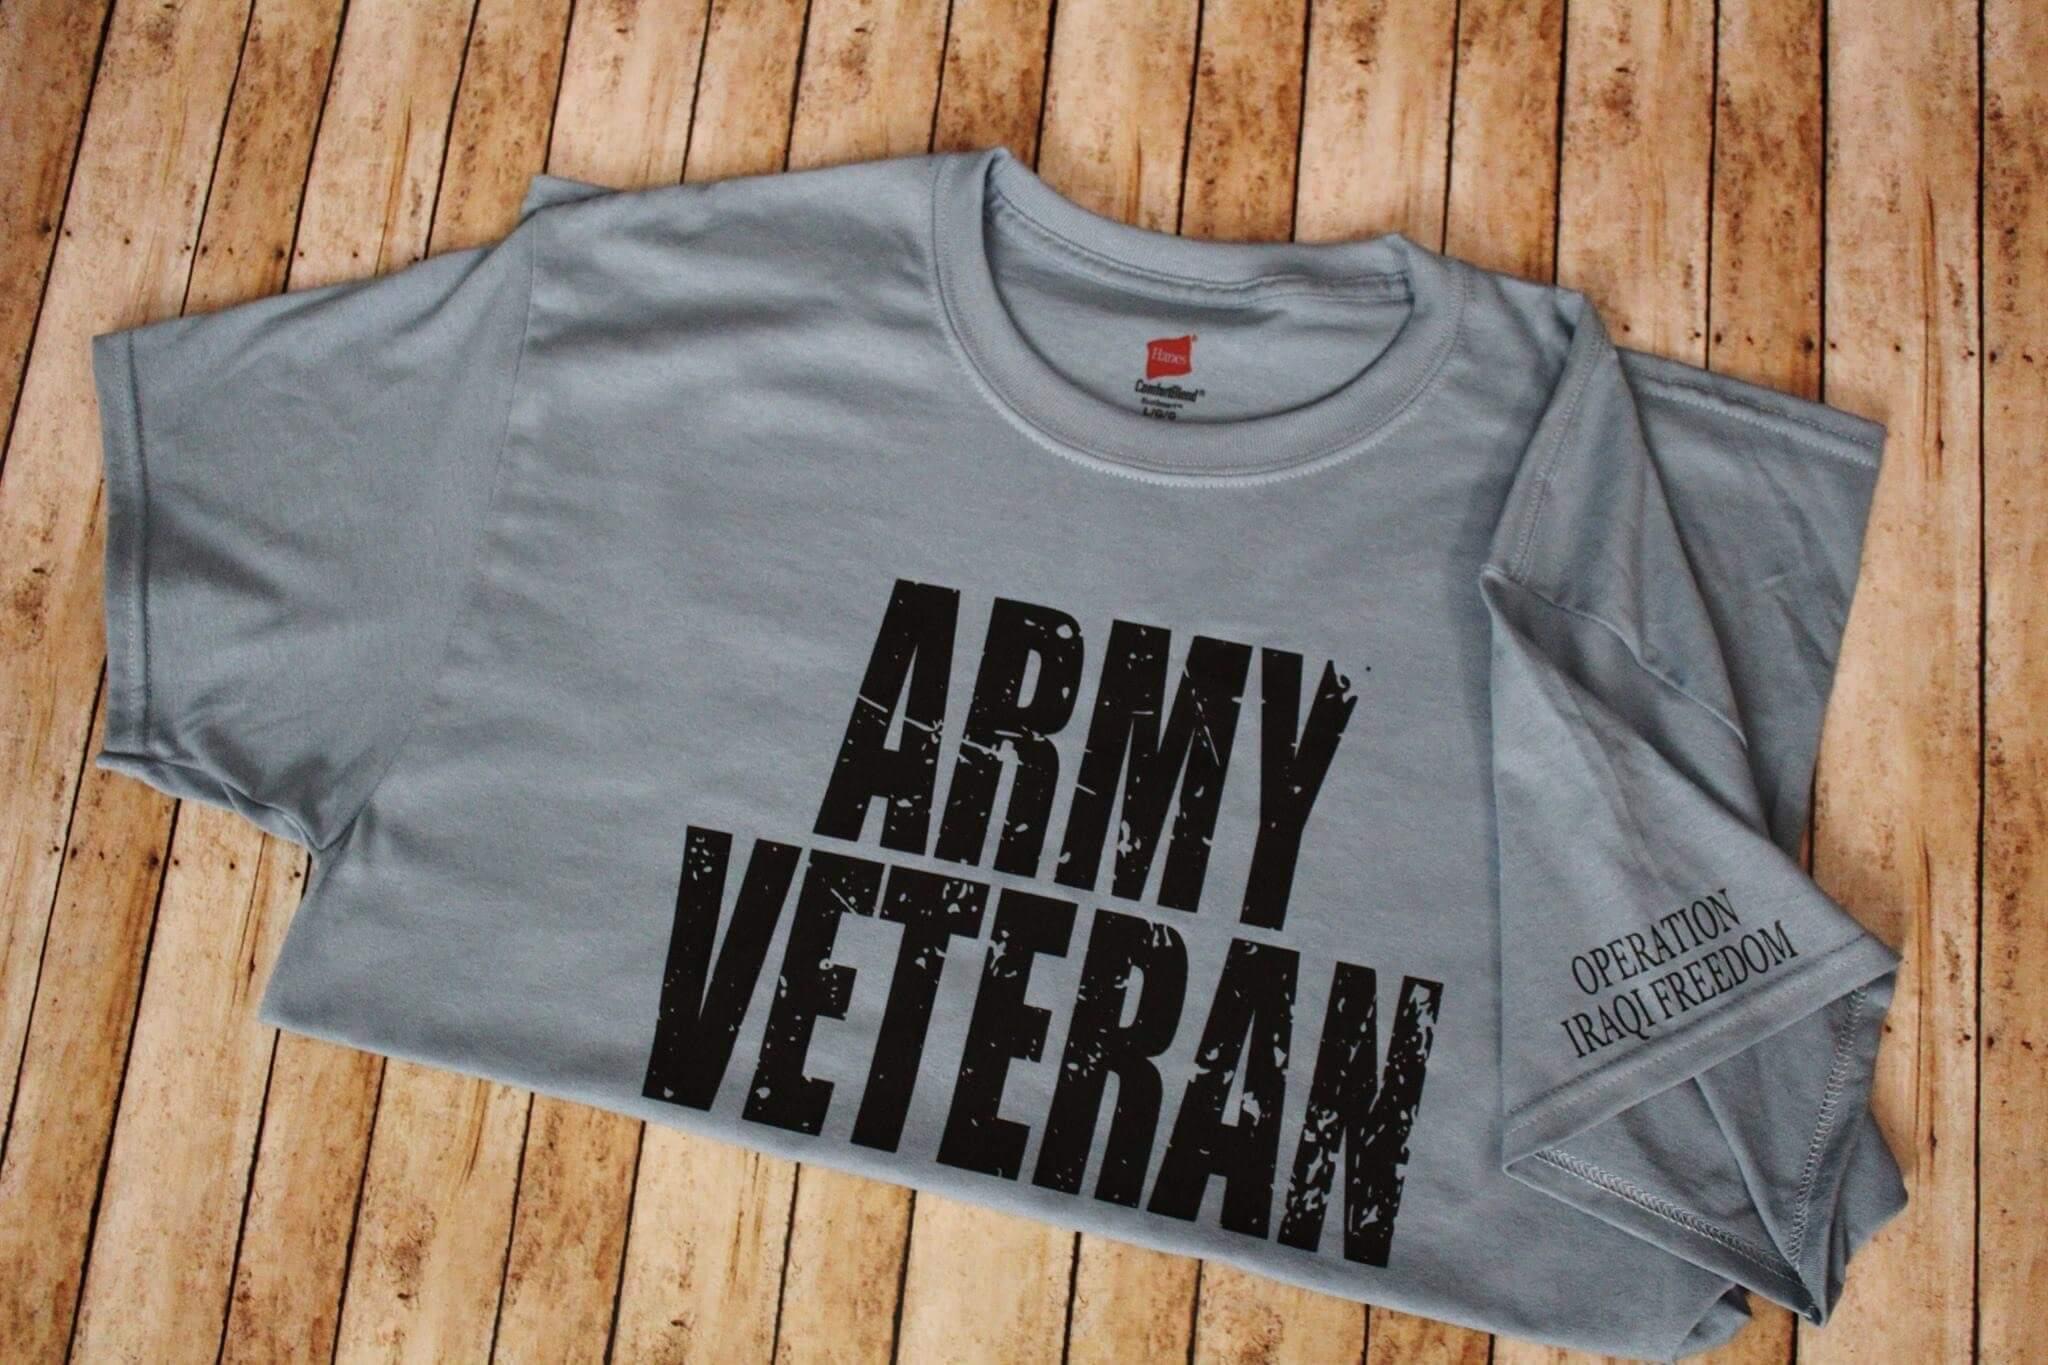 Army Veteran T-shirt made by James and Kayla Davis with a Cricut machine